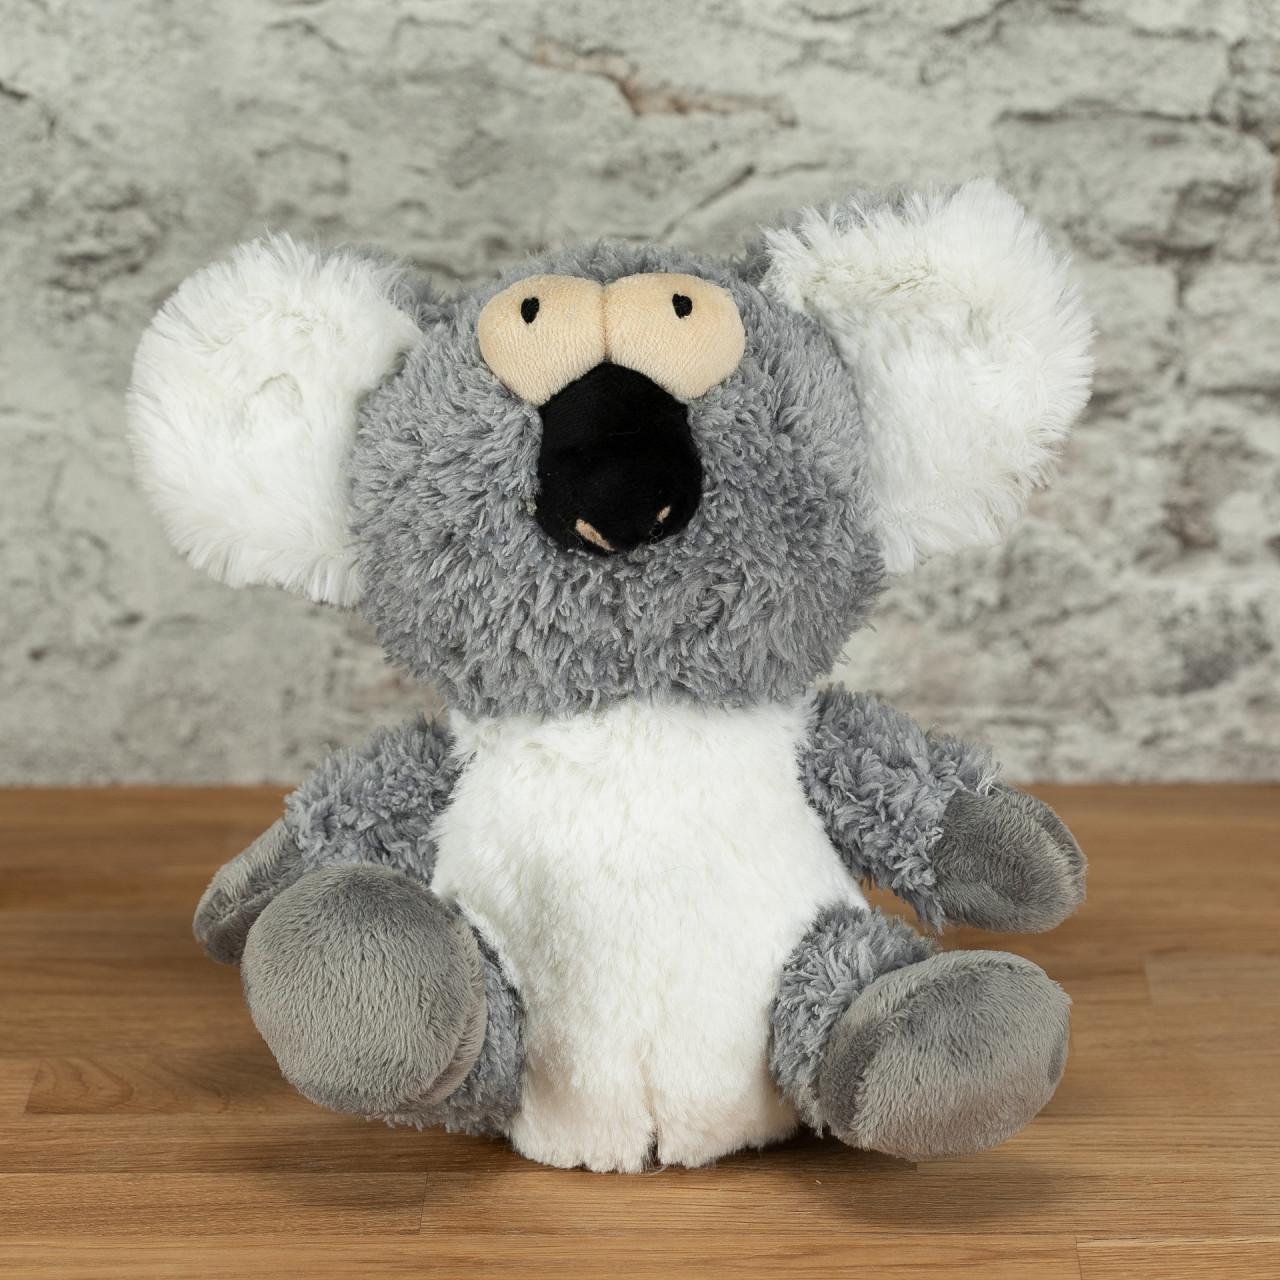 Hundespielzeug Kana, der Koala